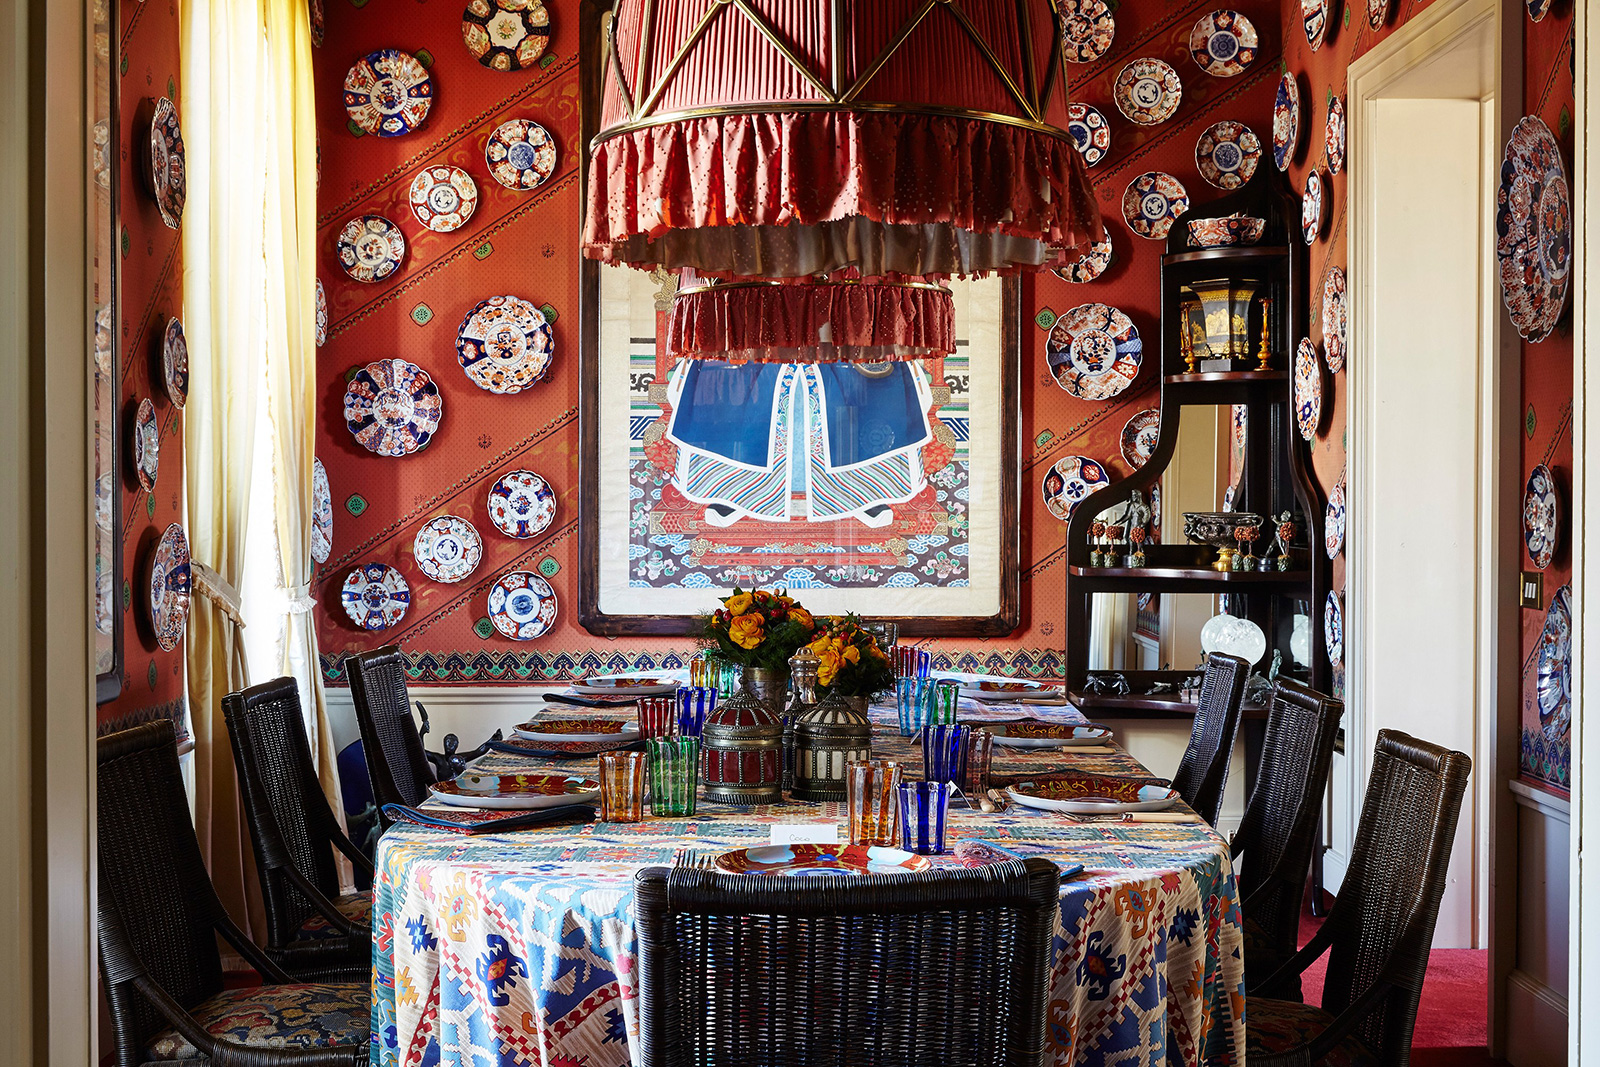 Cabana Magazine founder Martina Mondadori's dining room